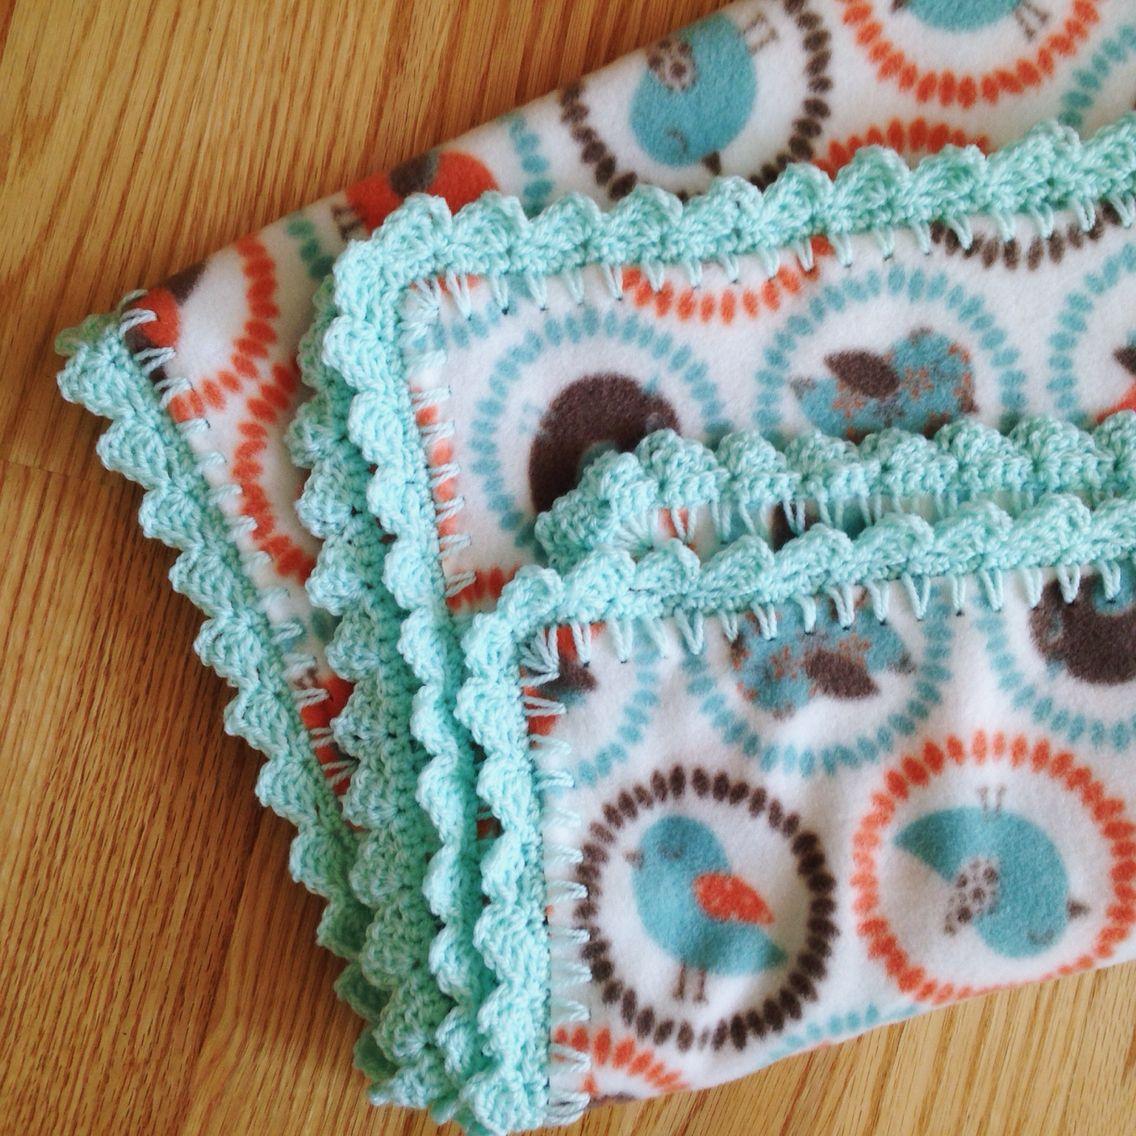 Fleece baby blanket with crochet border Completed